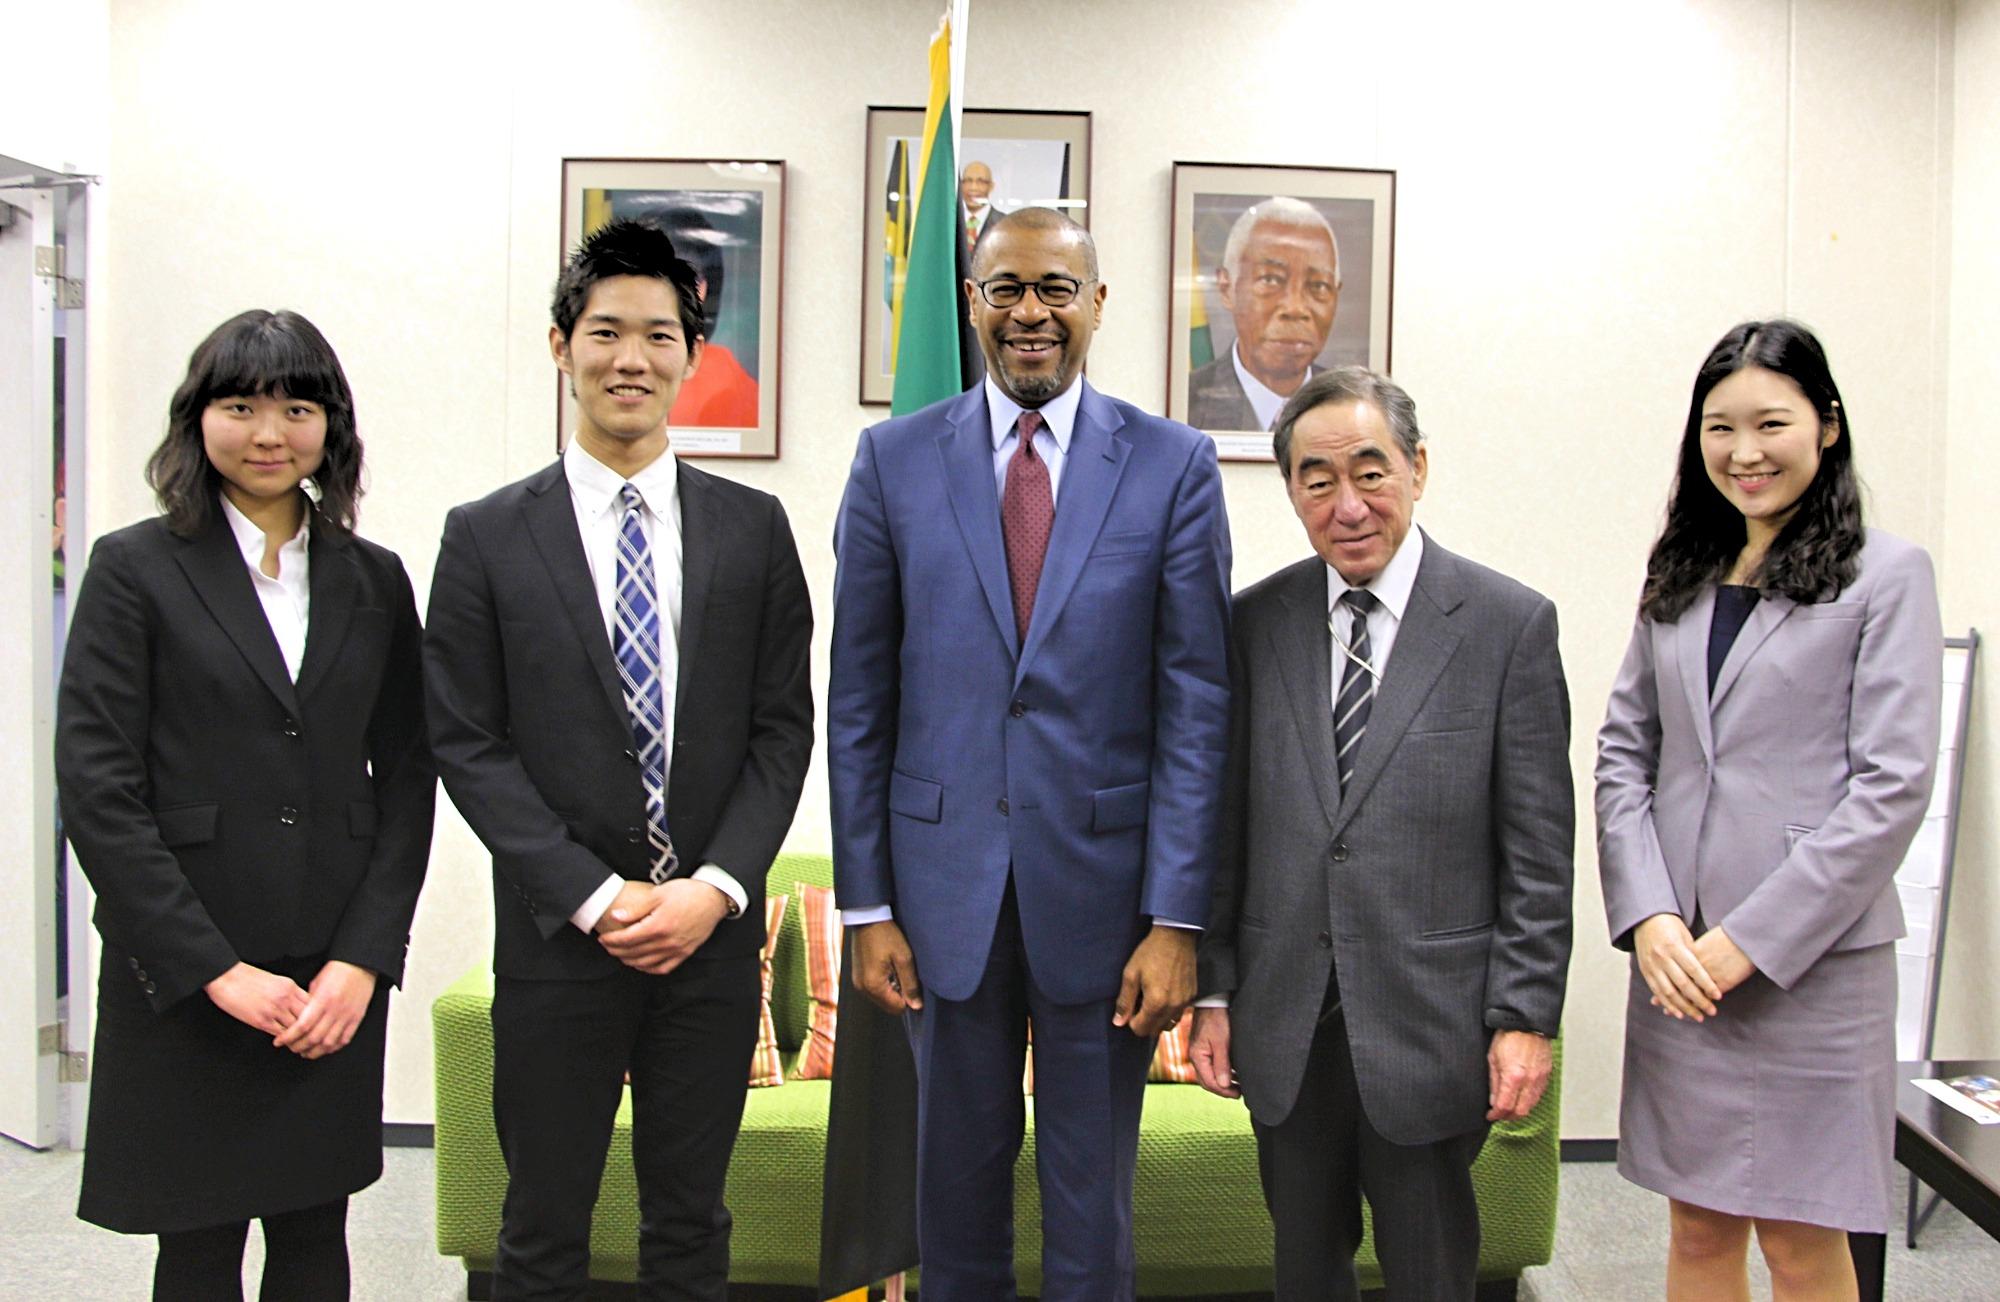 Interview with Kansai Gaidai University Professor Dr. Osamu Kataoka